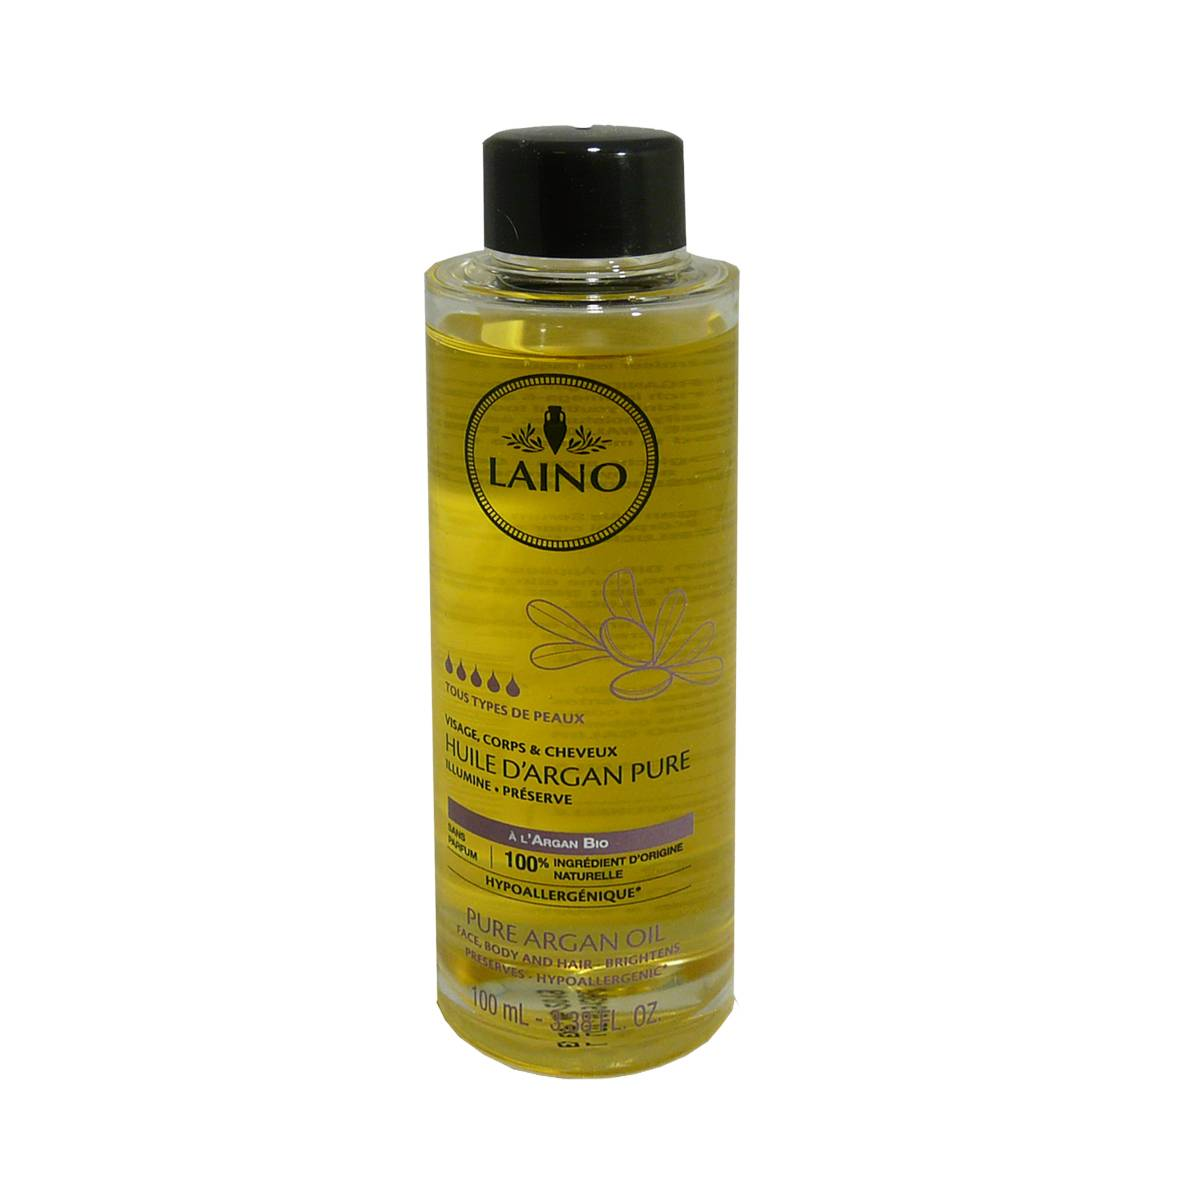 Laino huile d'argan pure 100 ml